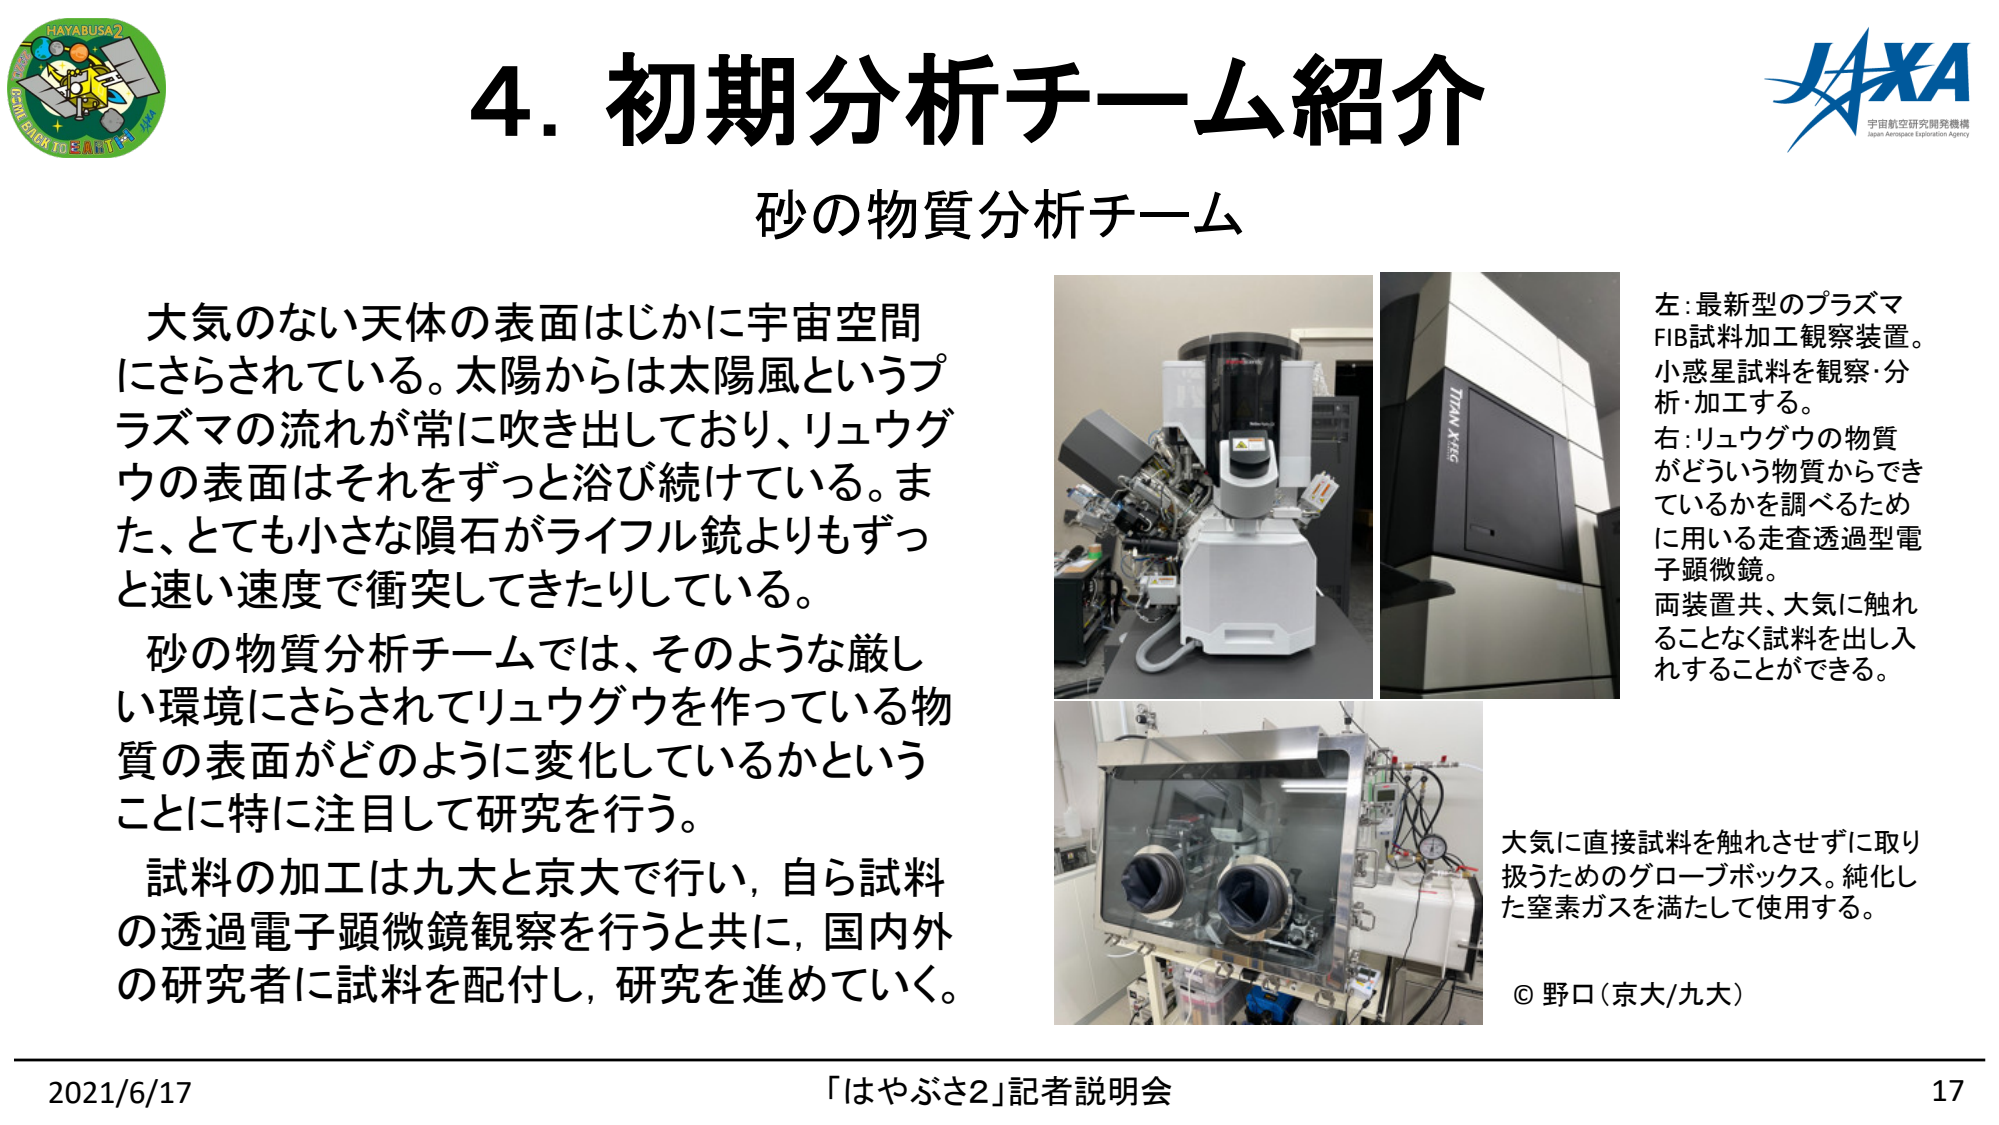 f:id:Imamura:20210617130304p:plain